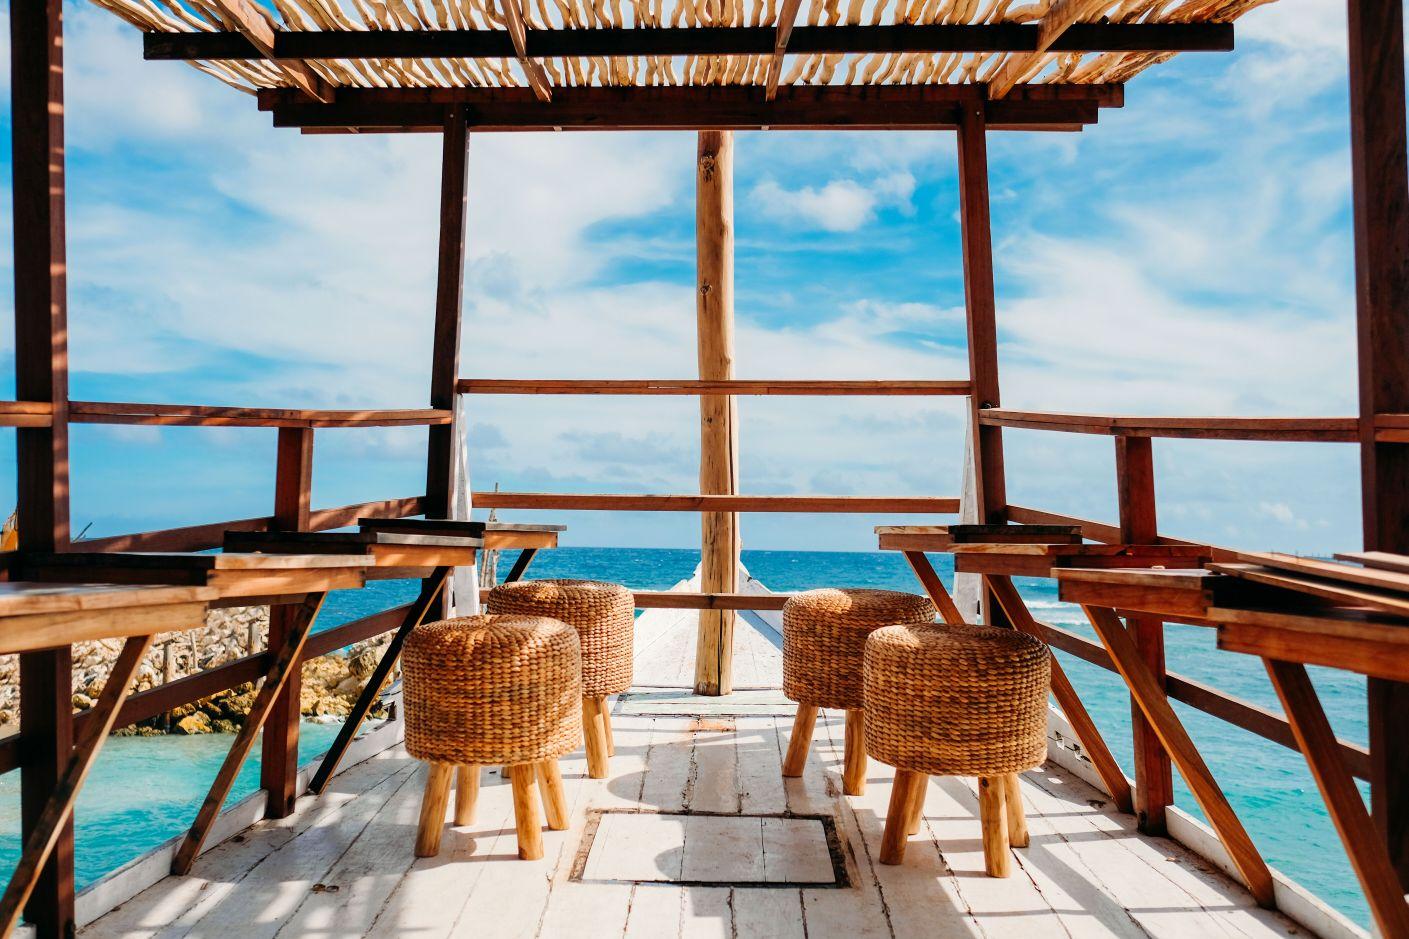 http://highend-traveller.com/idyllic-melasti-beach-welcomes-minoo-beach-club/